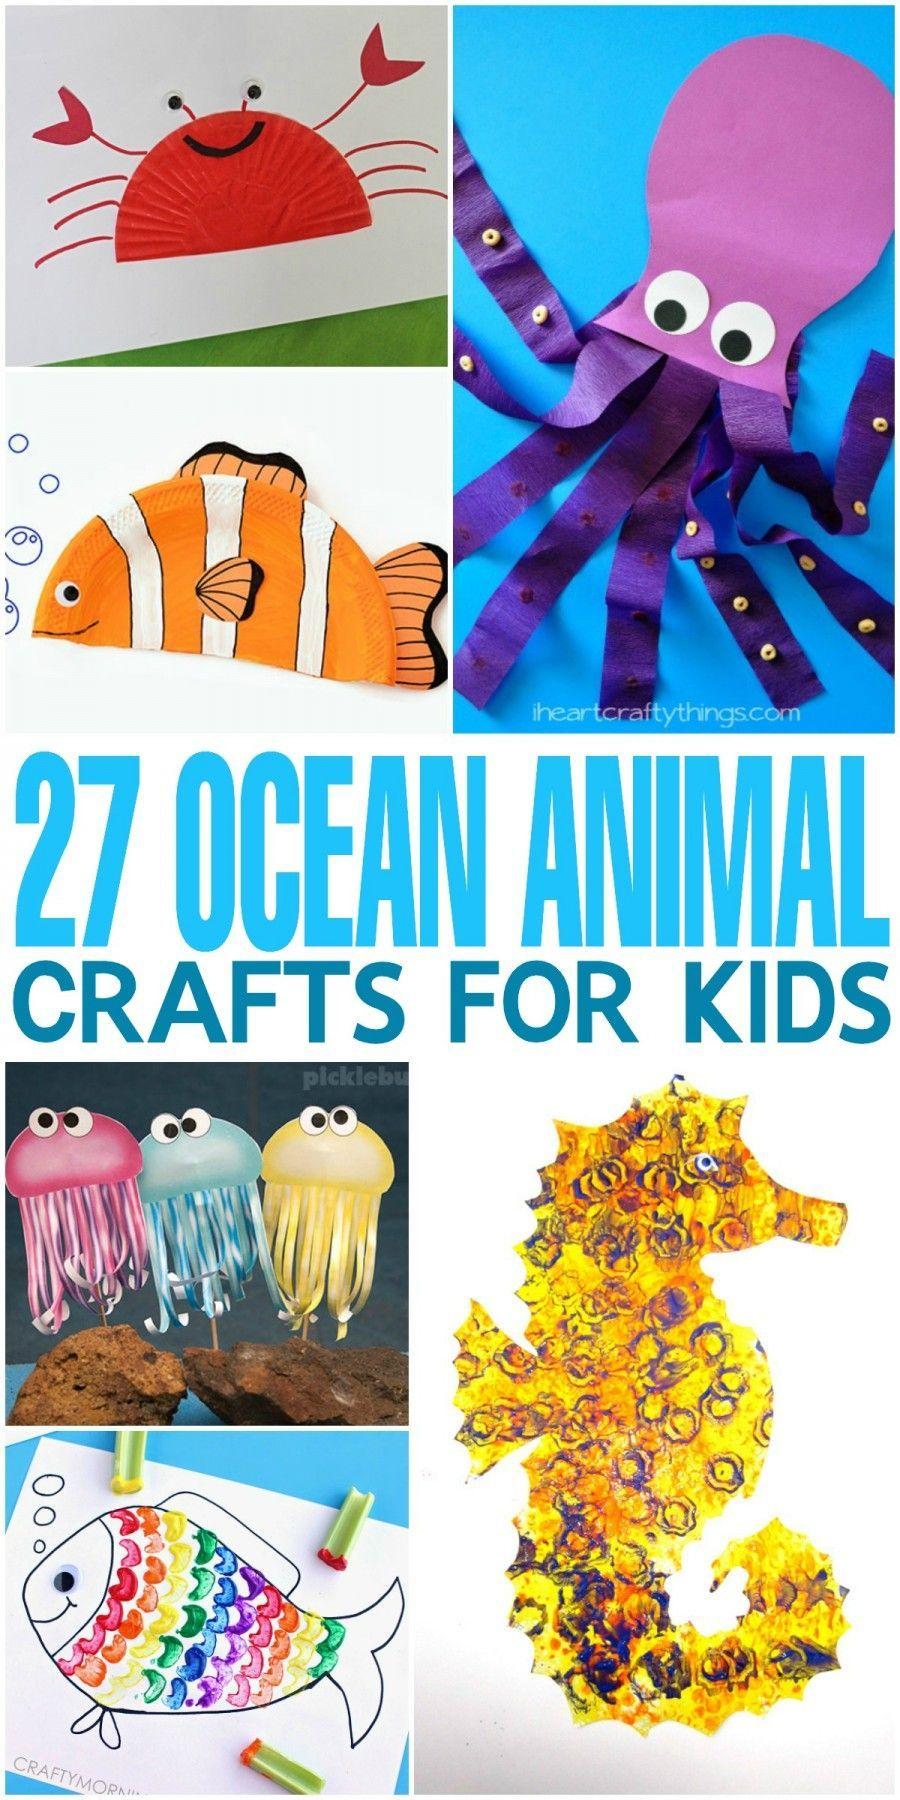 27 Ocean Animal Crafts For Kids Ocean Animal Crafts Animal Crafts For Kids Sea Crafts [ 1800 x 900 Pixel ]